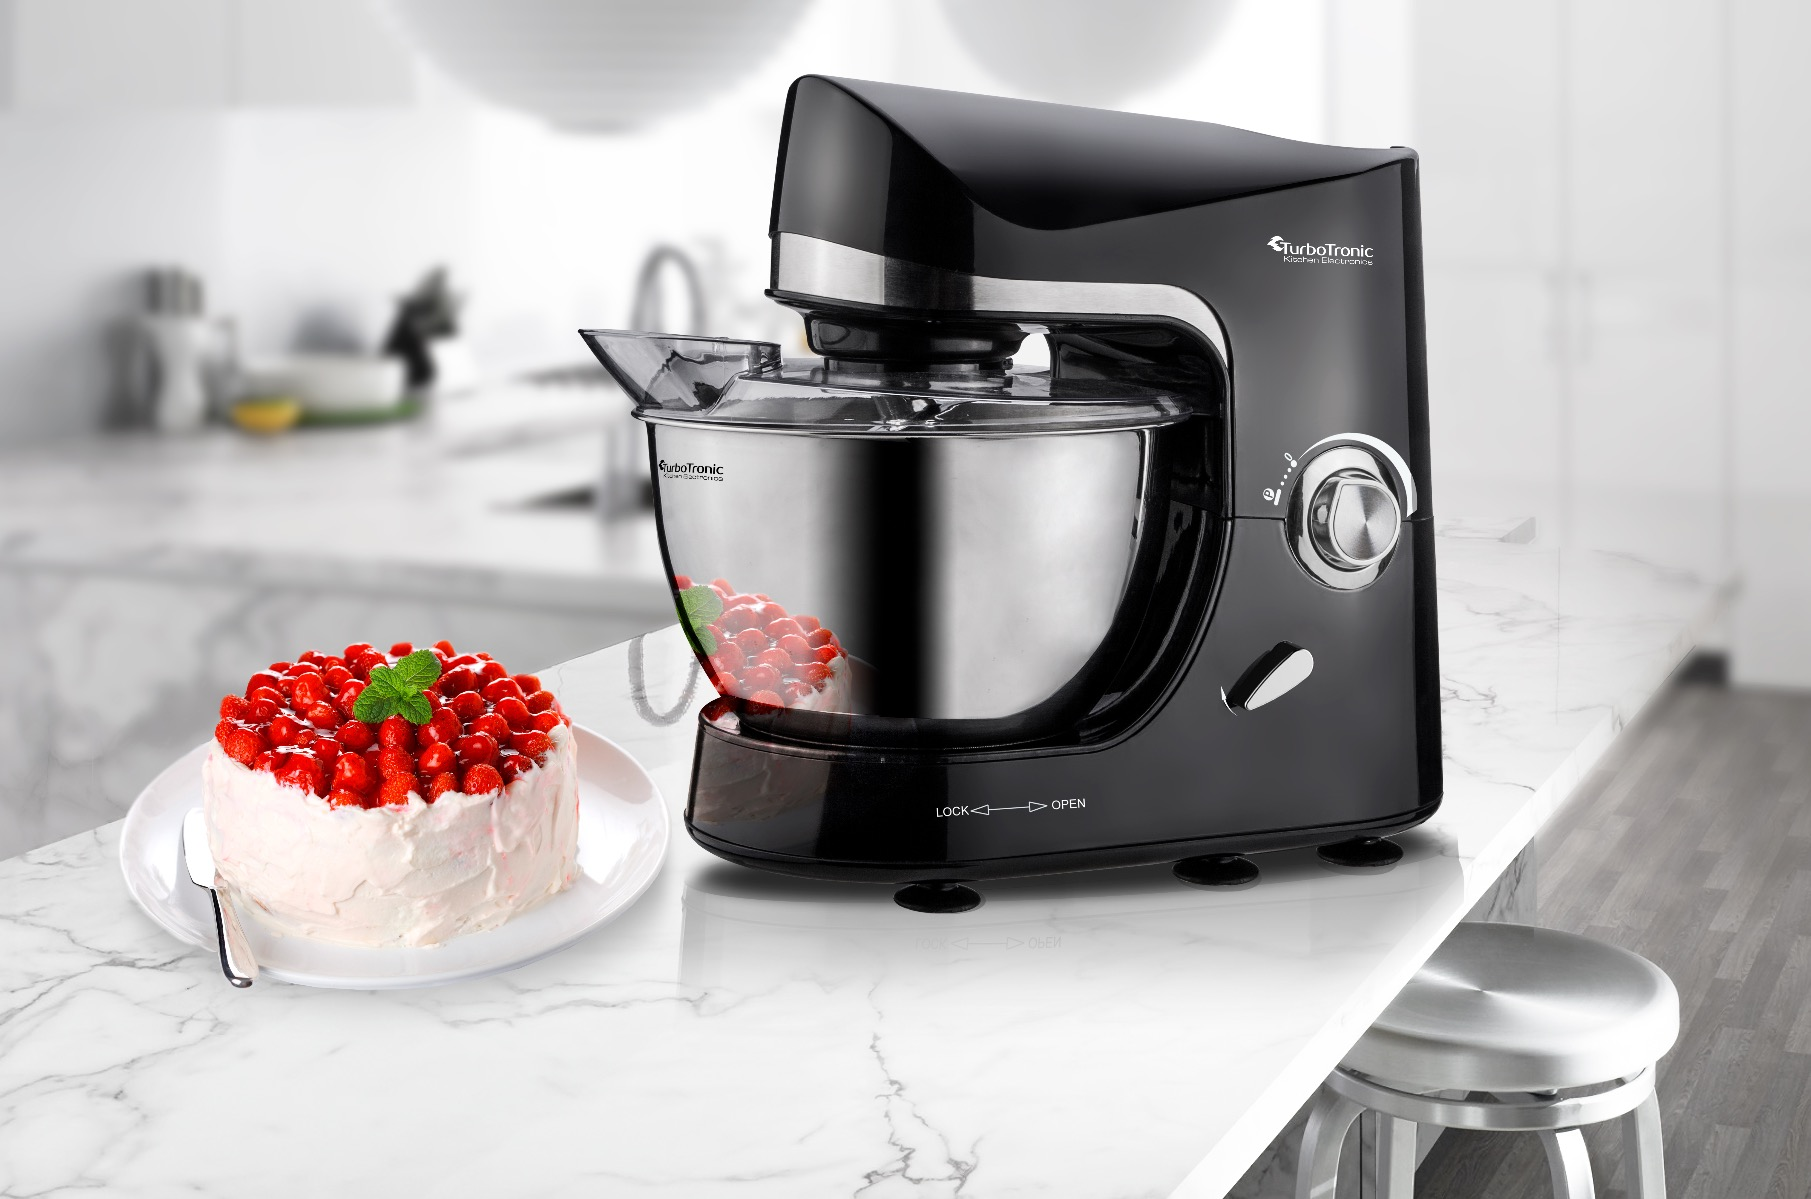 Pro-mix keukenmachine Turbotronic TT-002